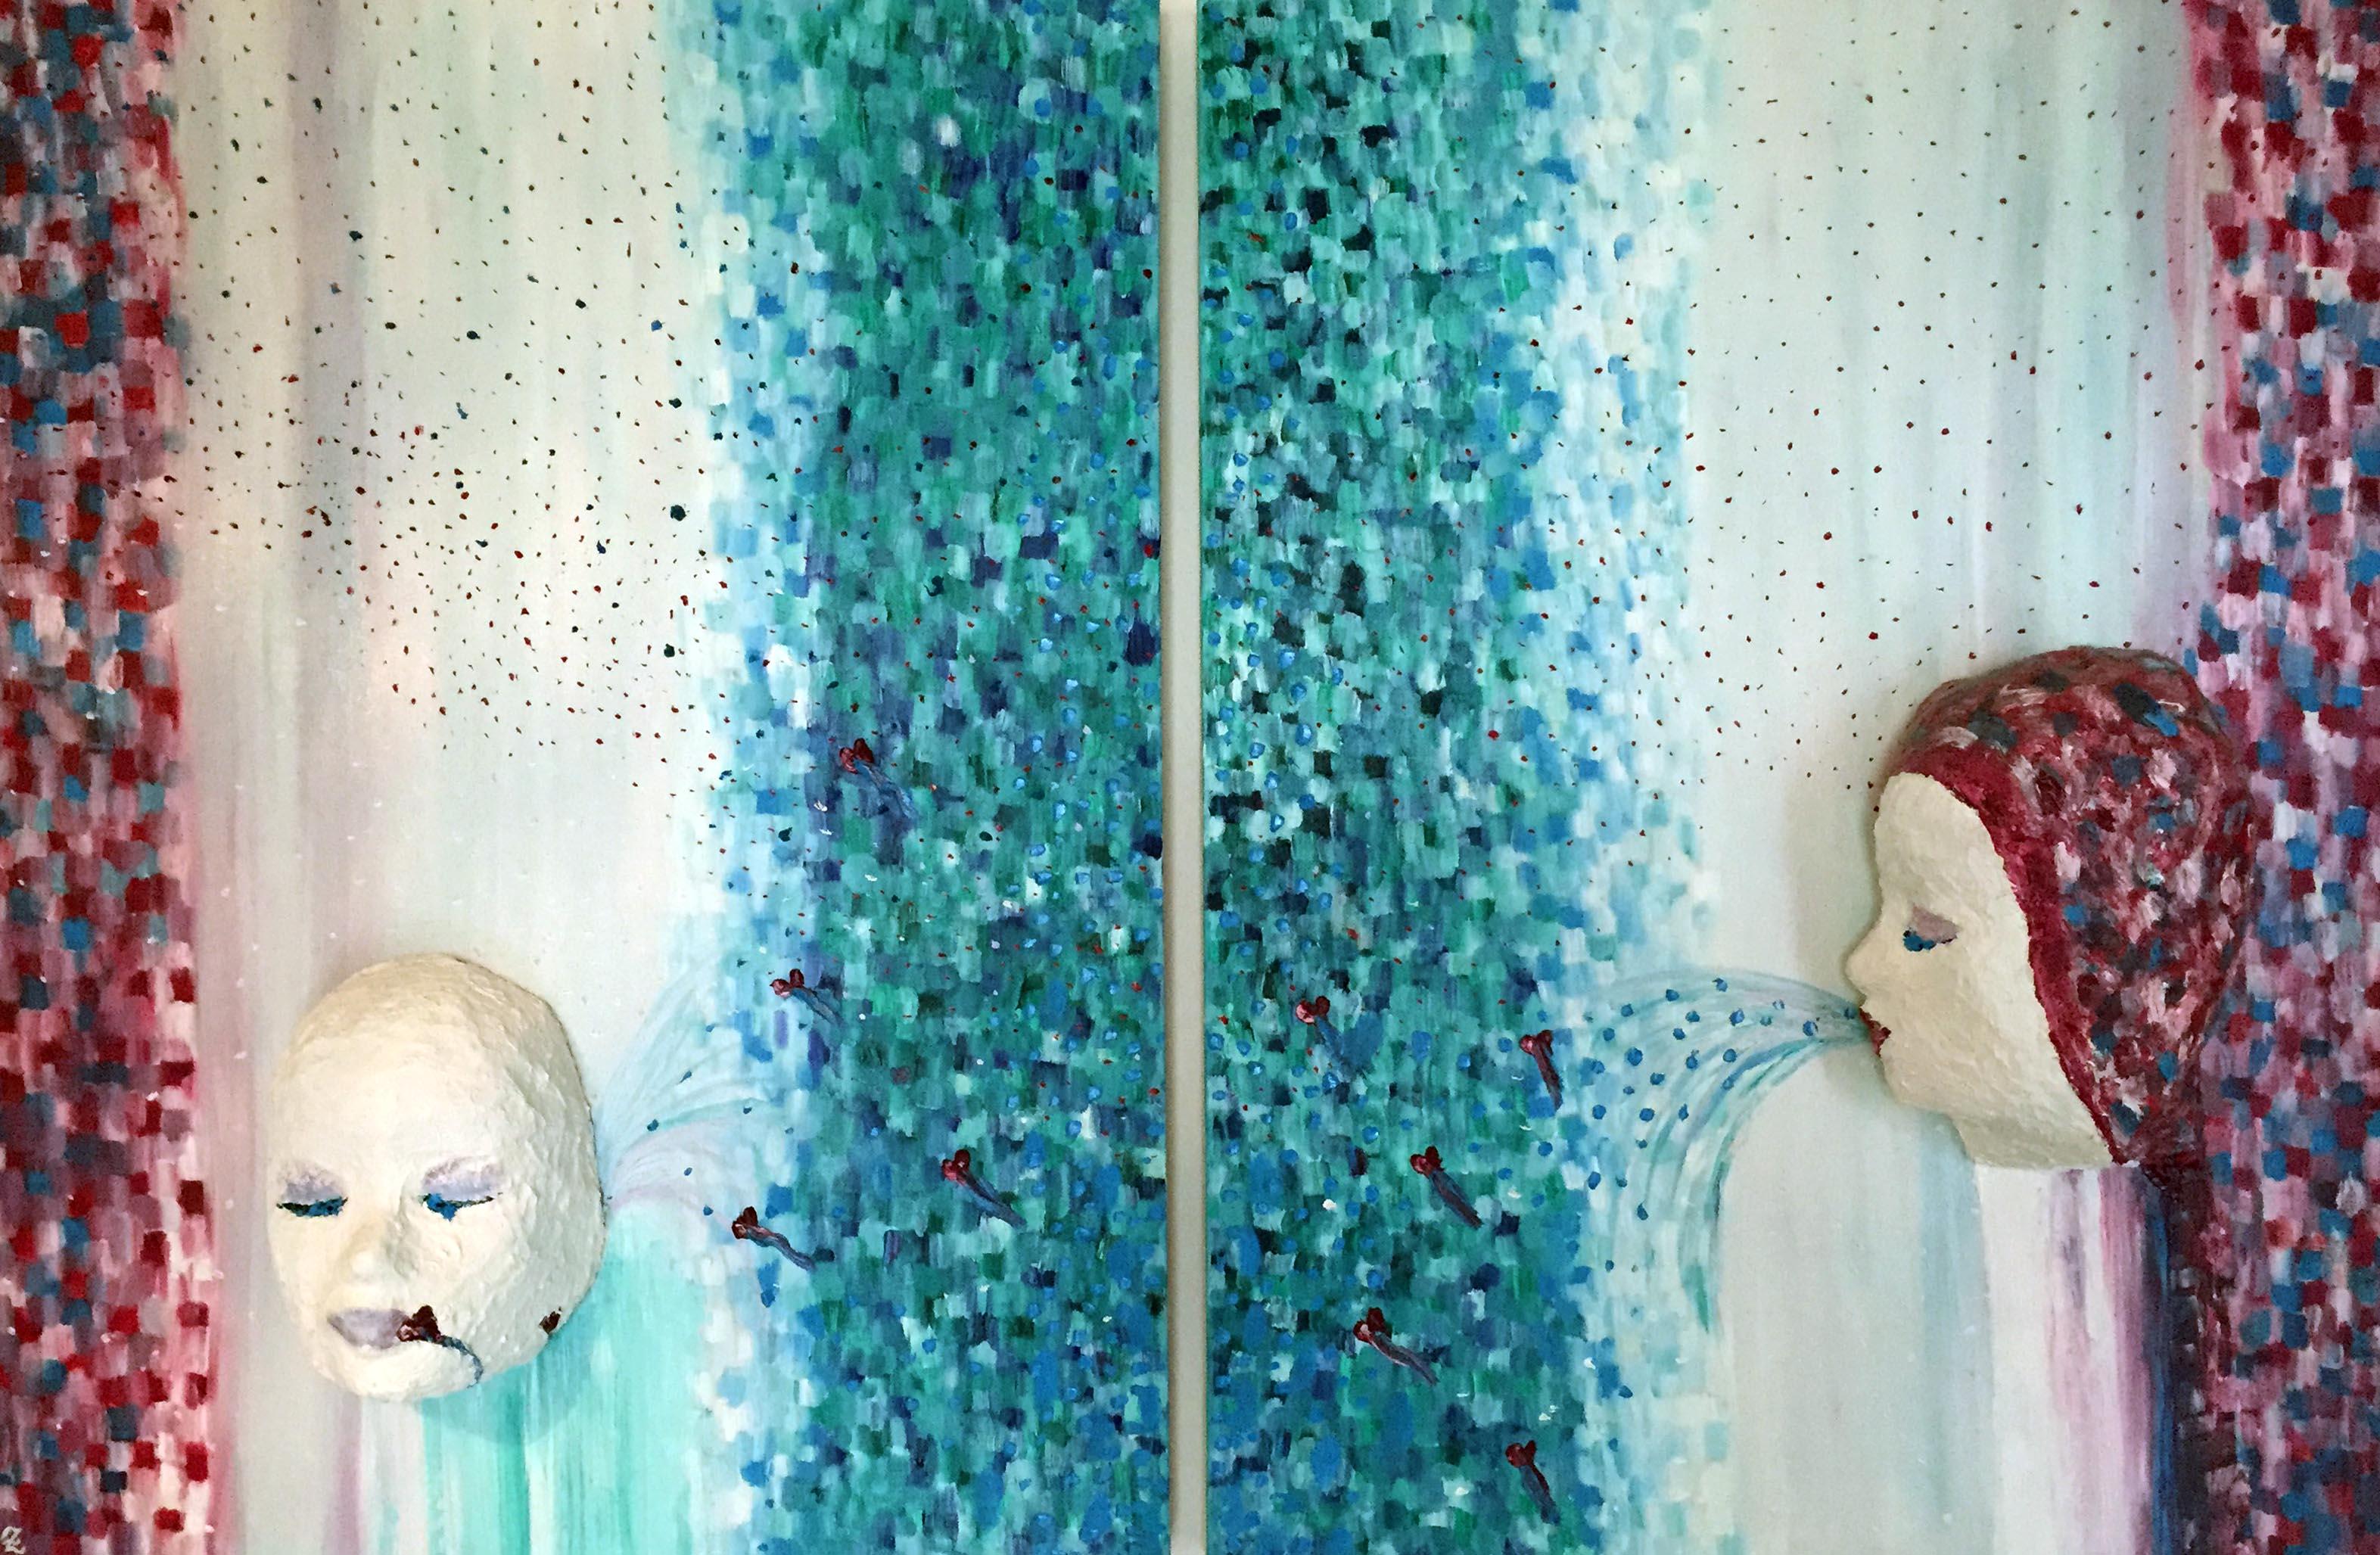 Soul shower.